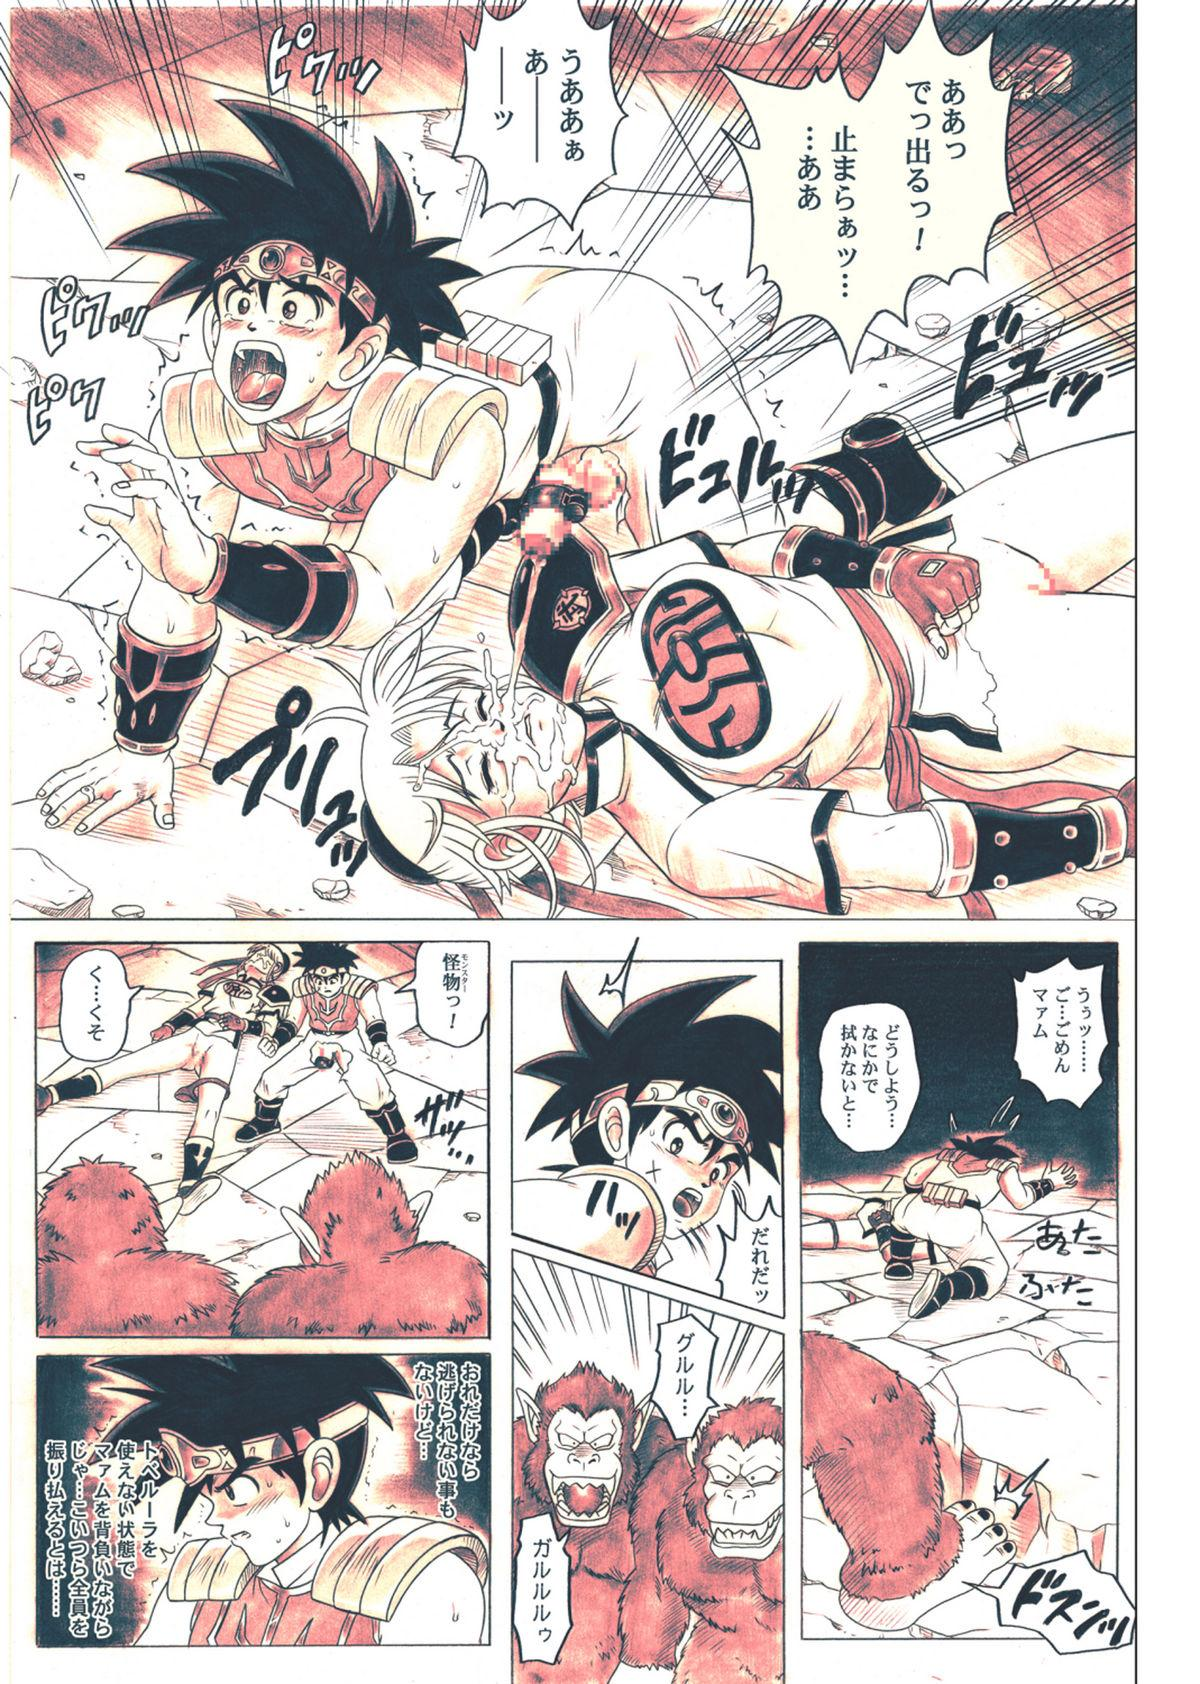 [Cyclone (Reizei, Izumi)] STAR TAC IDO ~Youkuso Haja no Doukutsu he~ Chuuhen Download edition (Dragon Warrior: Dai's Great Adventure) [Digital] 94